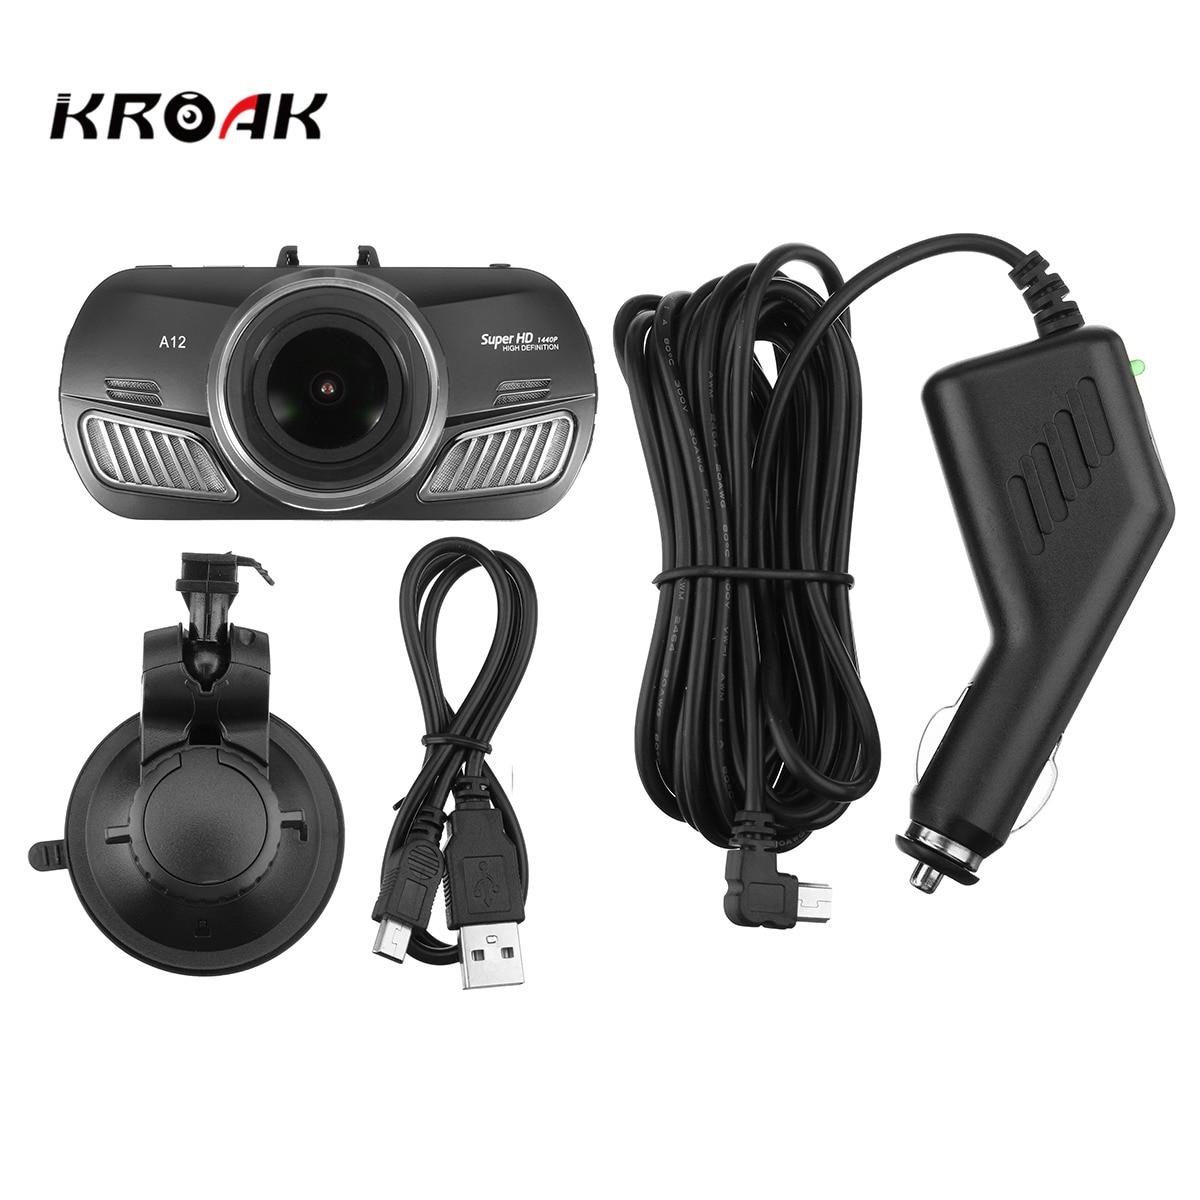 Здесь можно купить  KROAK Car Vehicle HD 1440P Mini DVR Video Recorder Camcorder G-Sensor Night Vision Vehicle Traveling Date Recorder  Автомобили и Мотоциклы